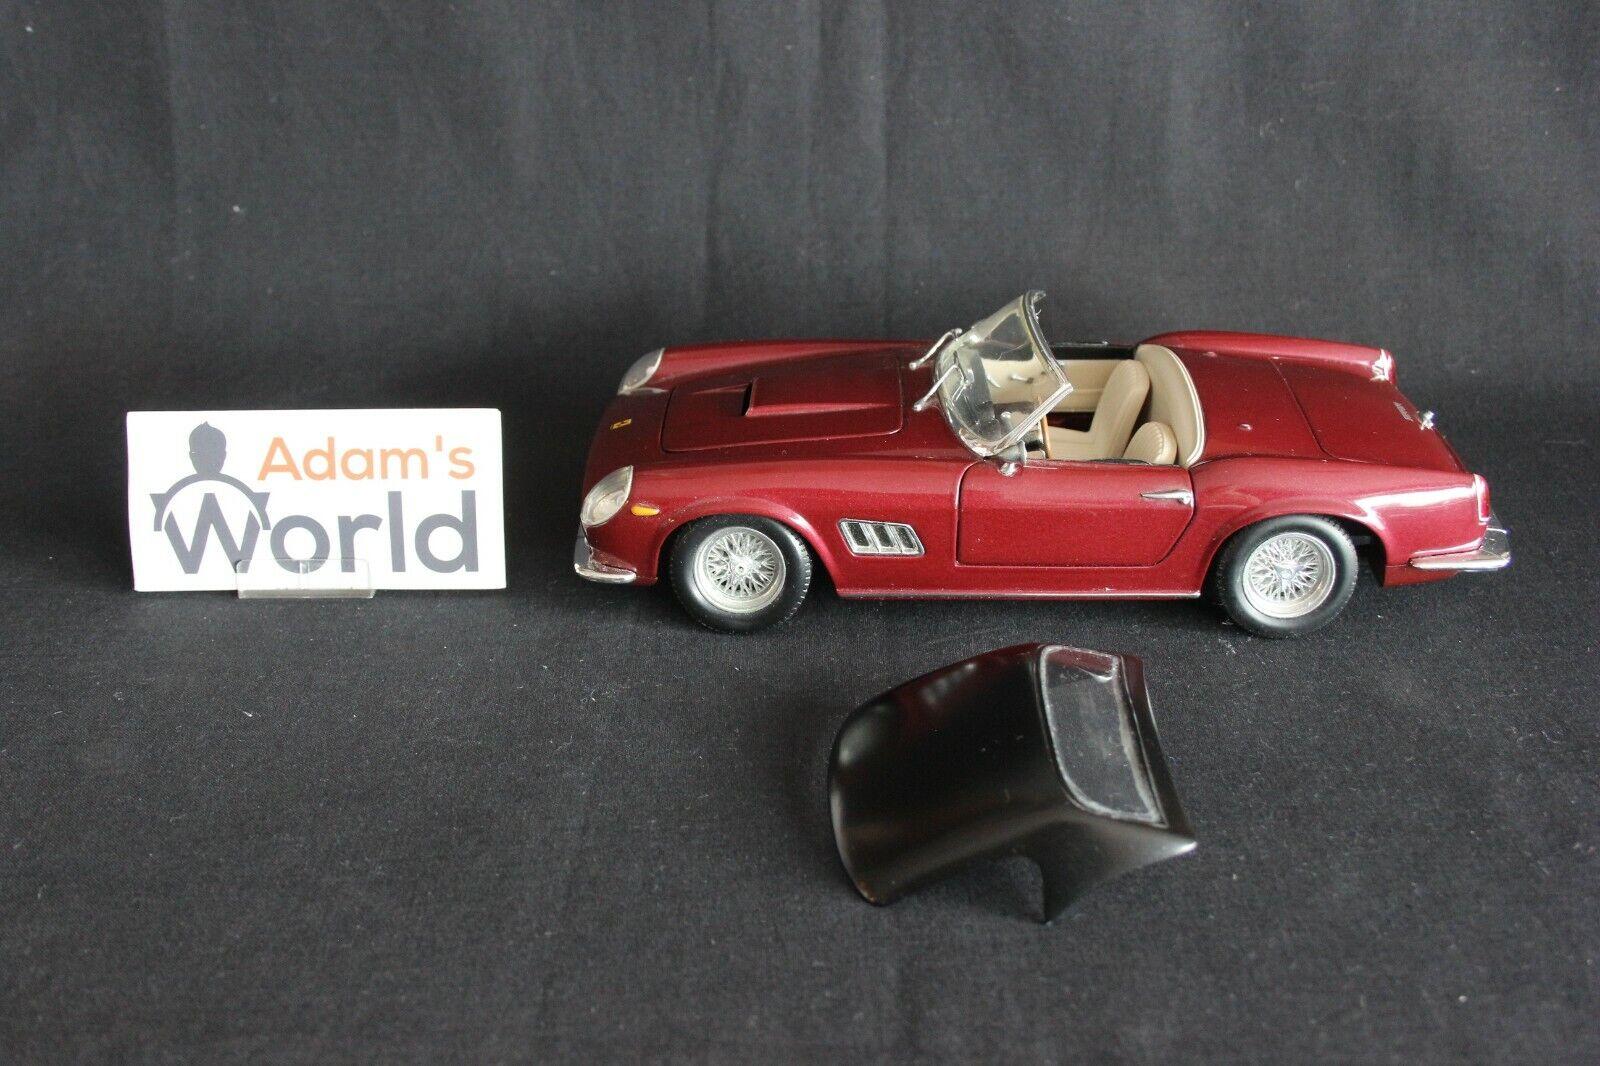 Hot Wheels Ferrari 250 GT California Spider 1 18 dark rot + hard top (PJBB)